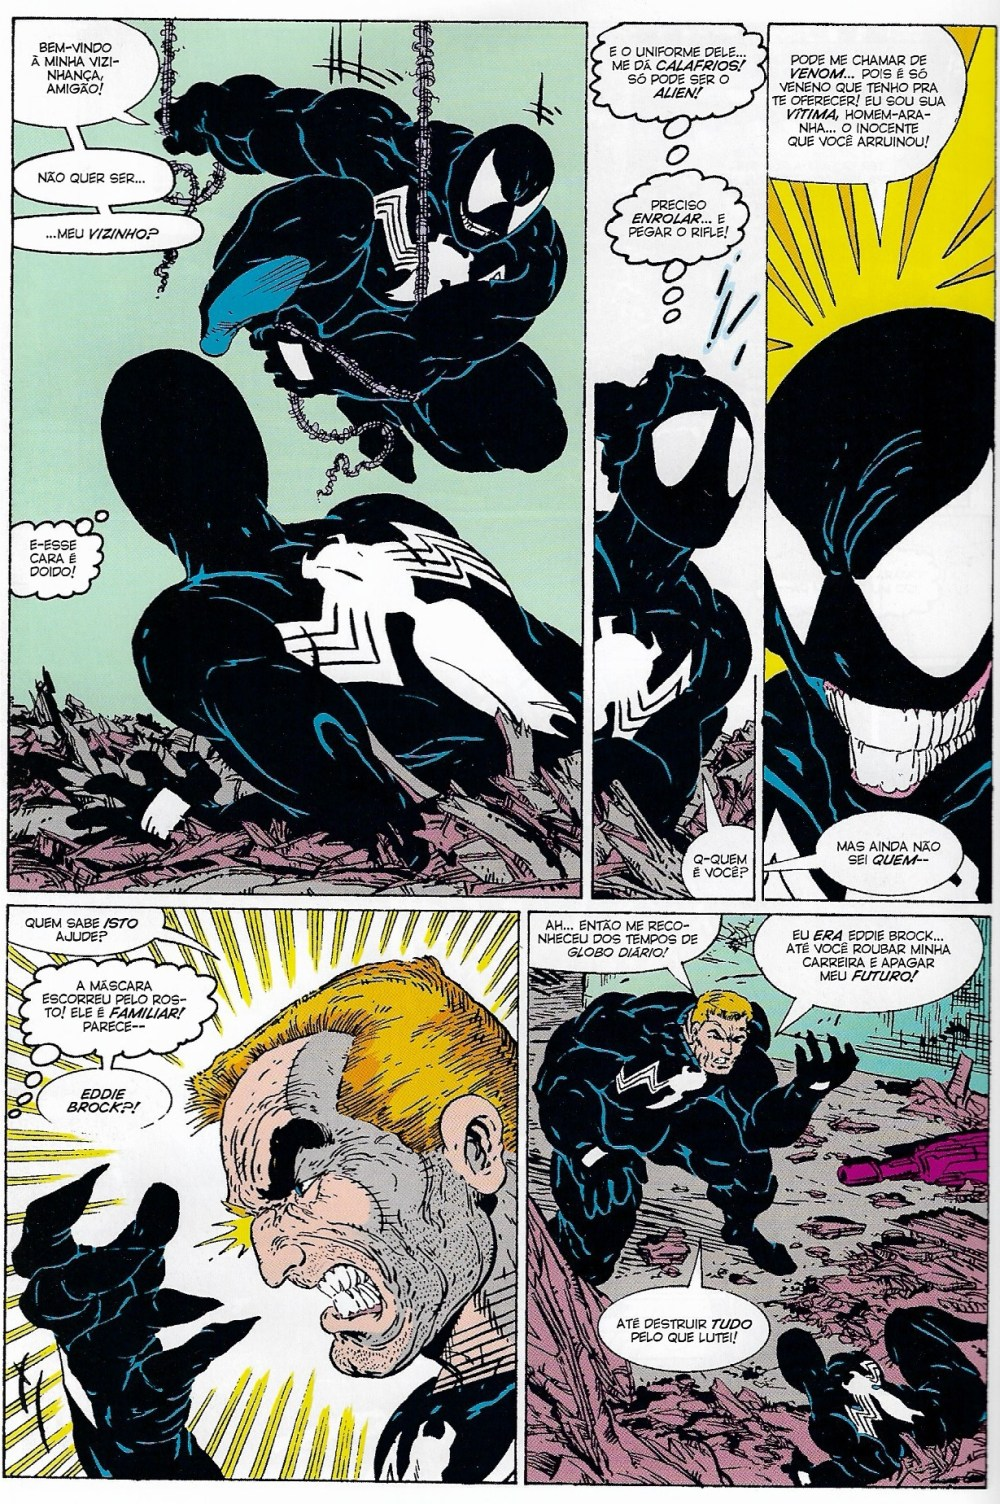 Venom Homem Aranha Spider Man Marvel Amazing Spider Man #300